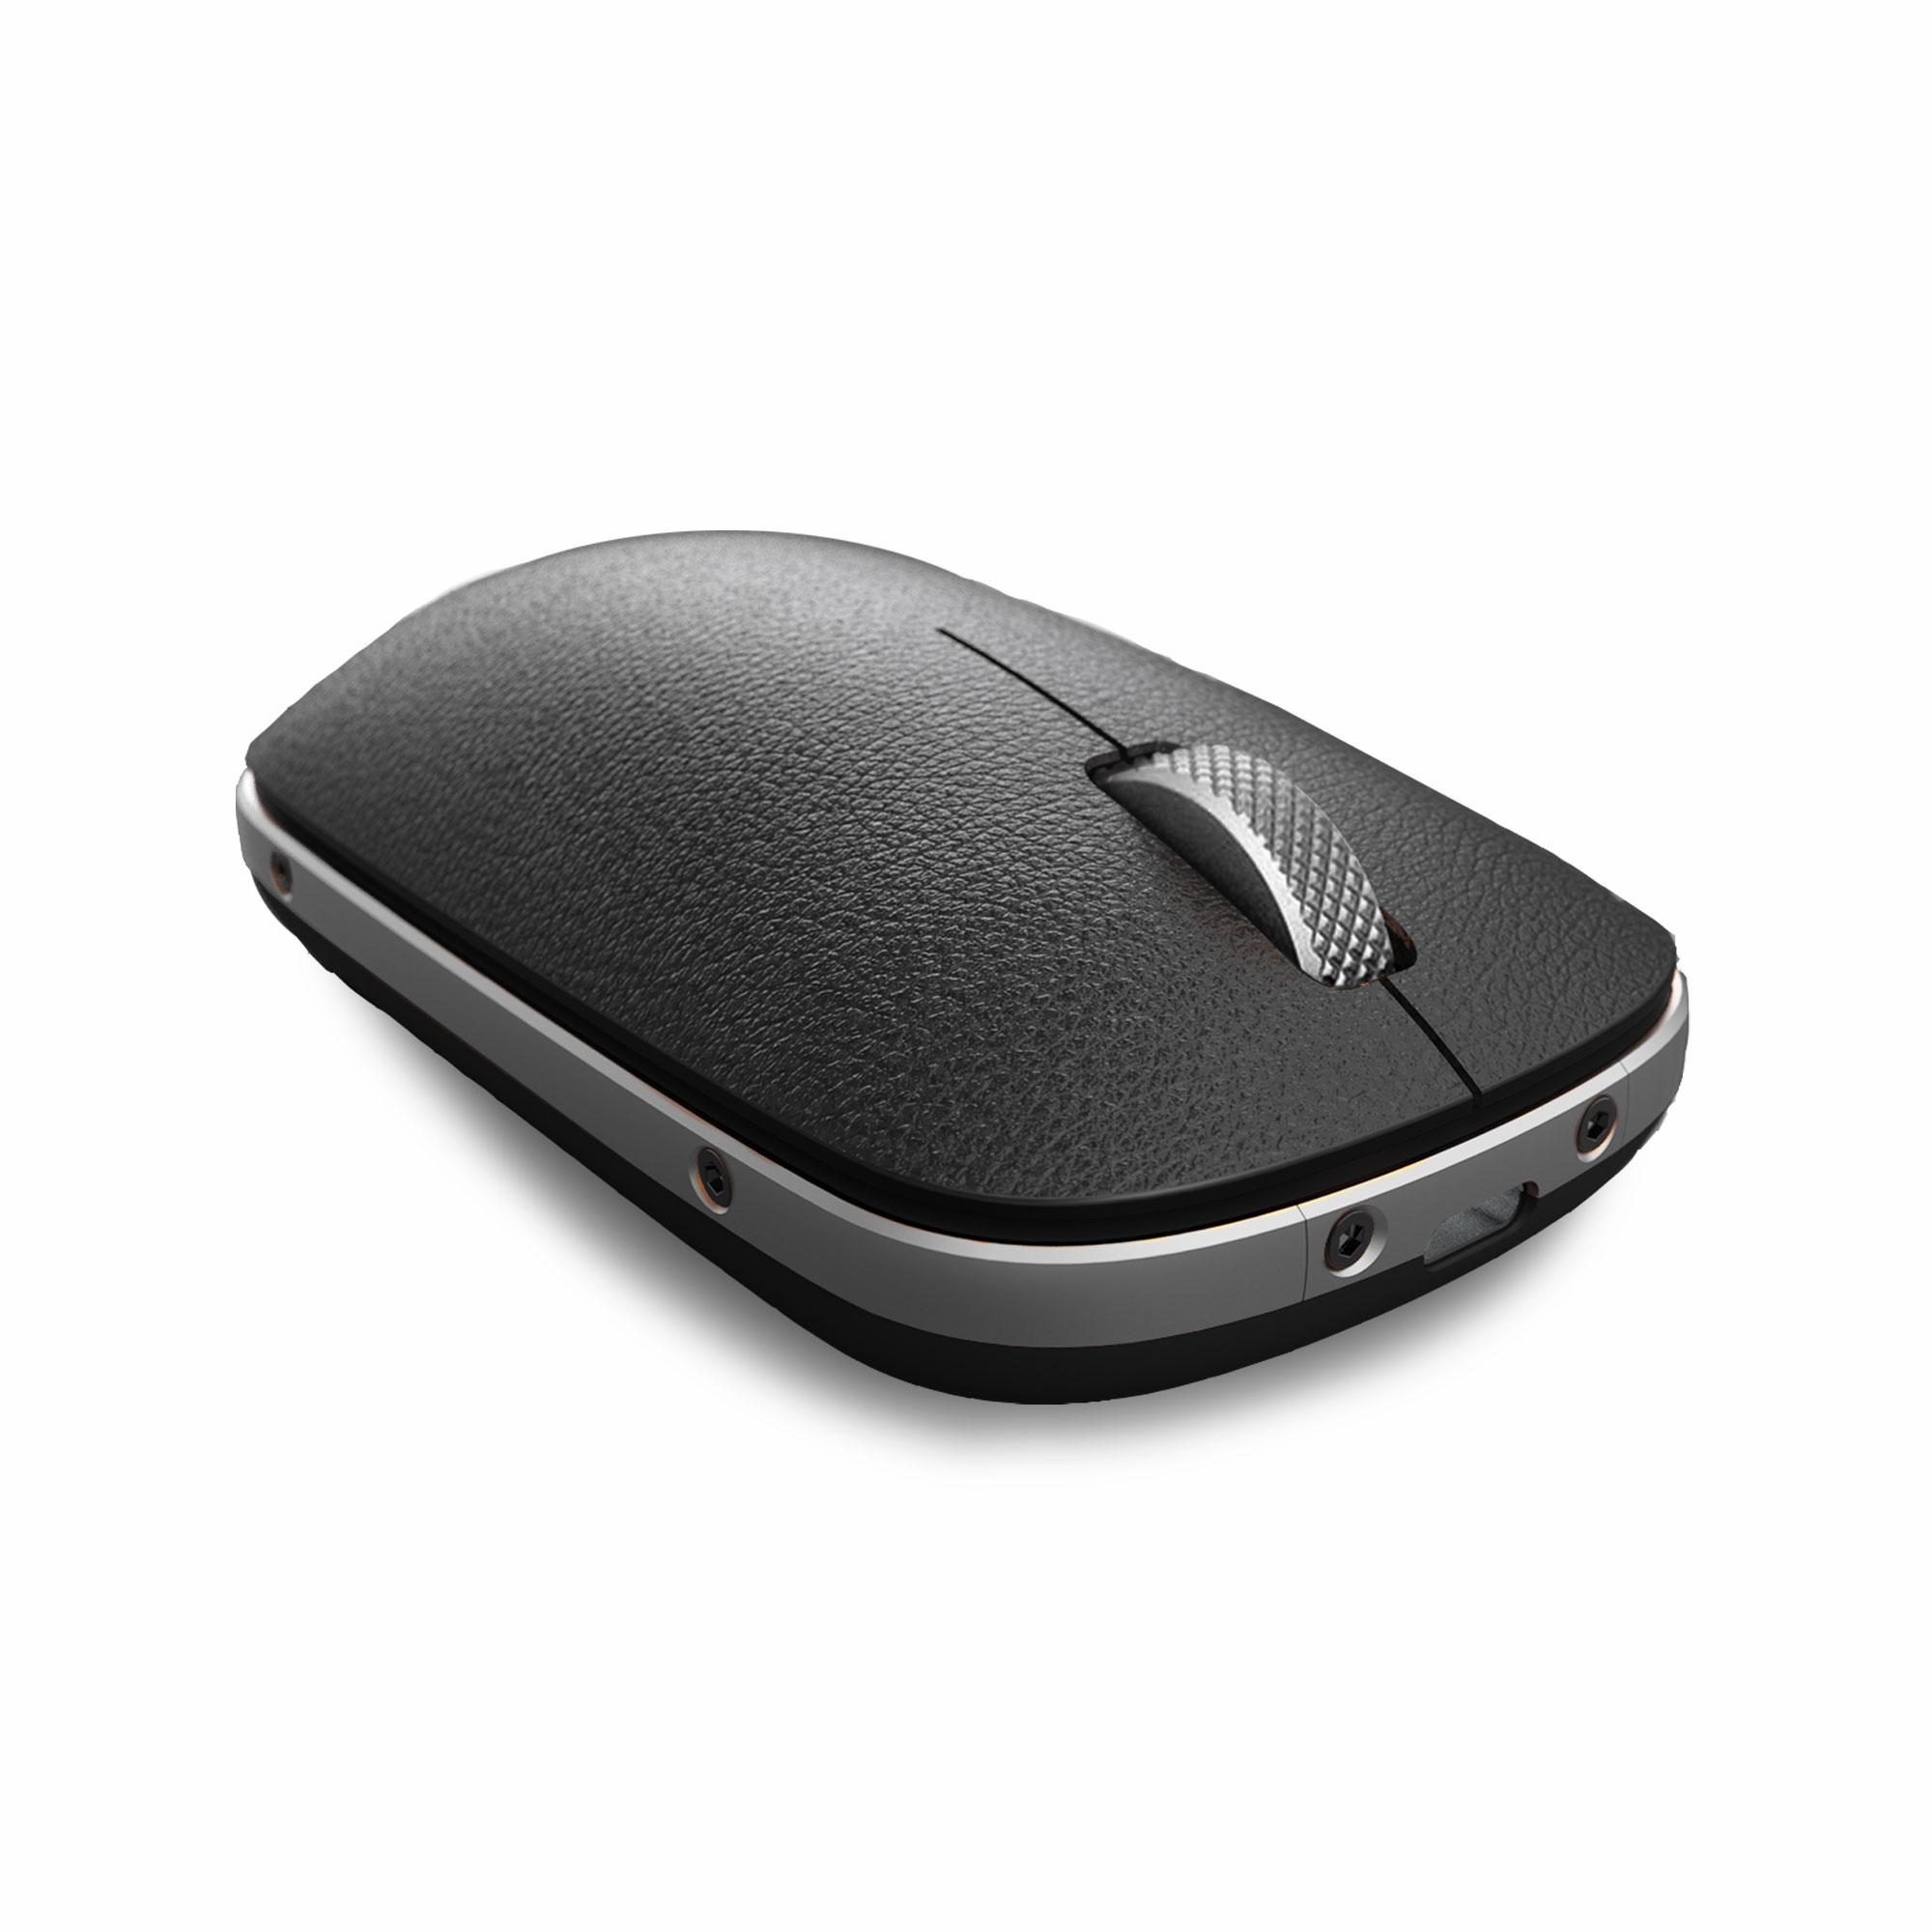 Azio Retro Classic Mouse (RCM)